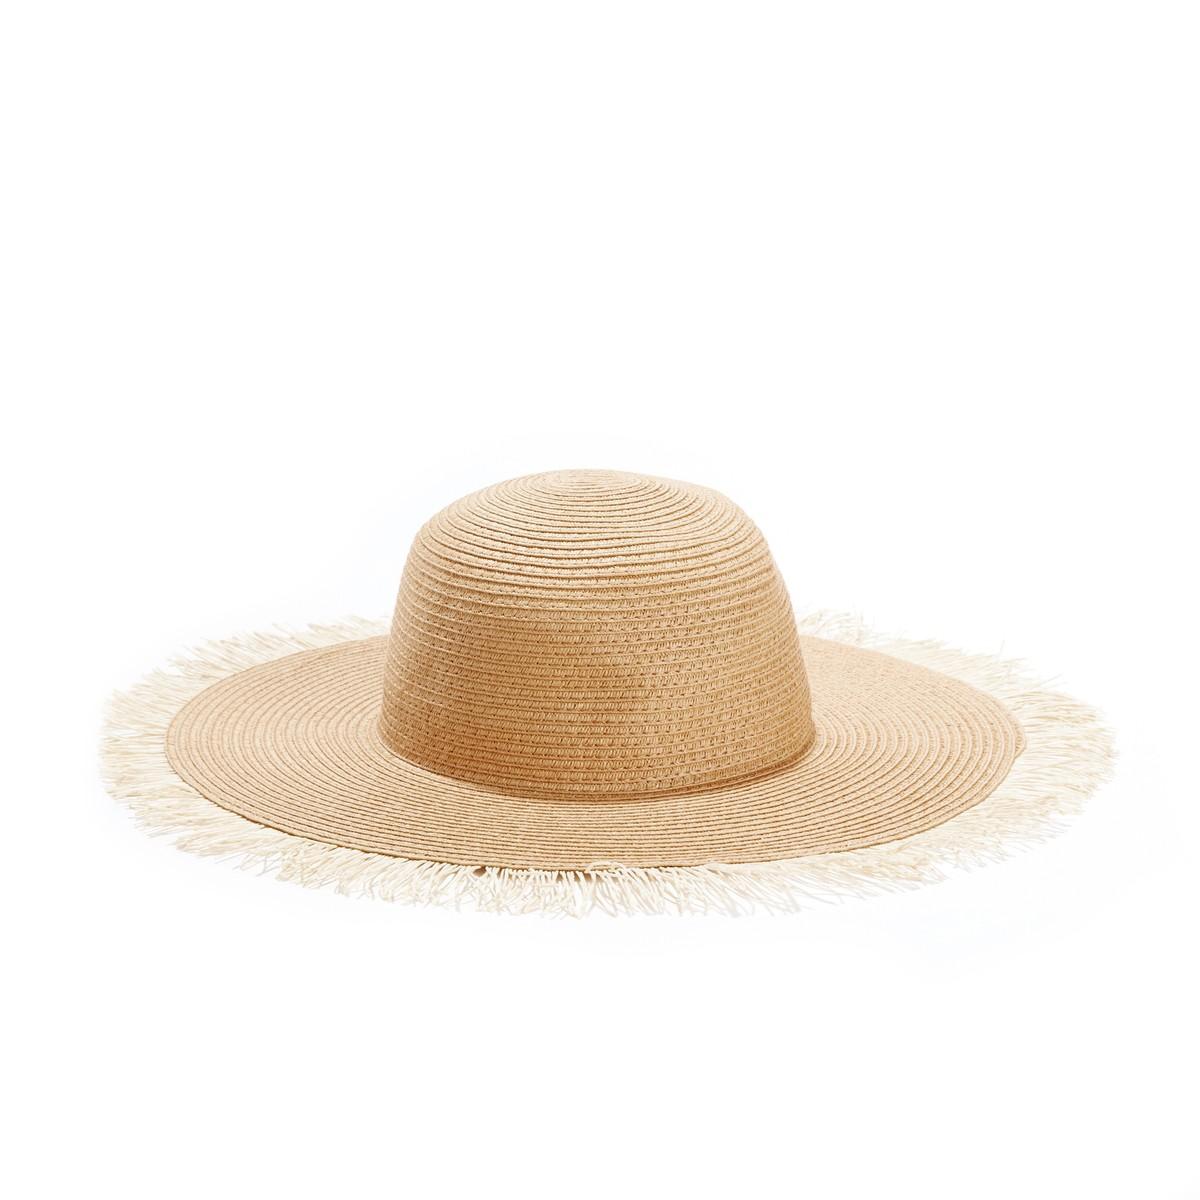 46bfd32359f4b laredoutte-sombrero-paja-deshilachado. Pamela deshilachada